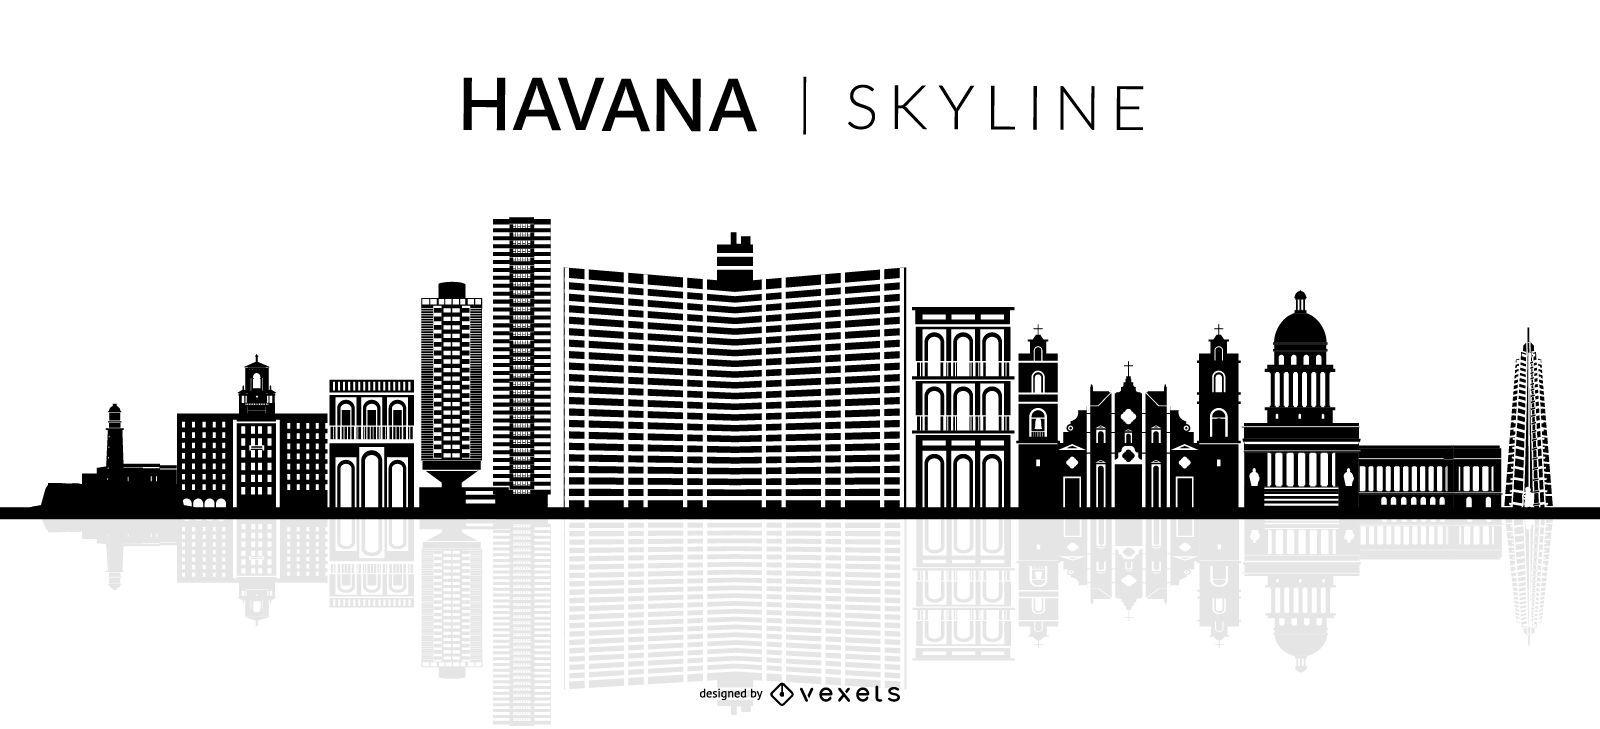 Havana City Skyline Silhouette